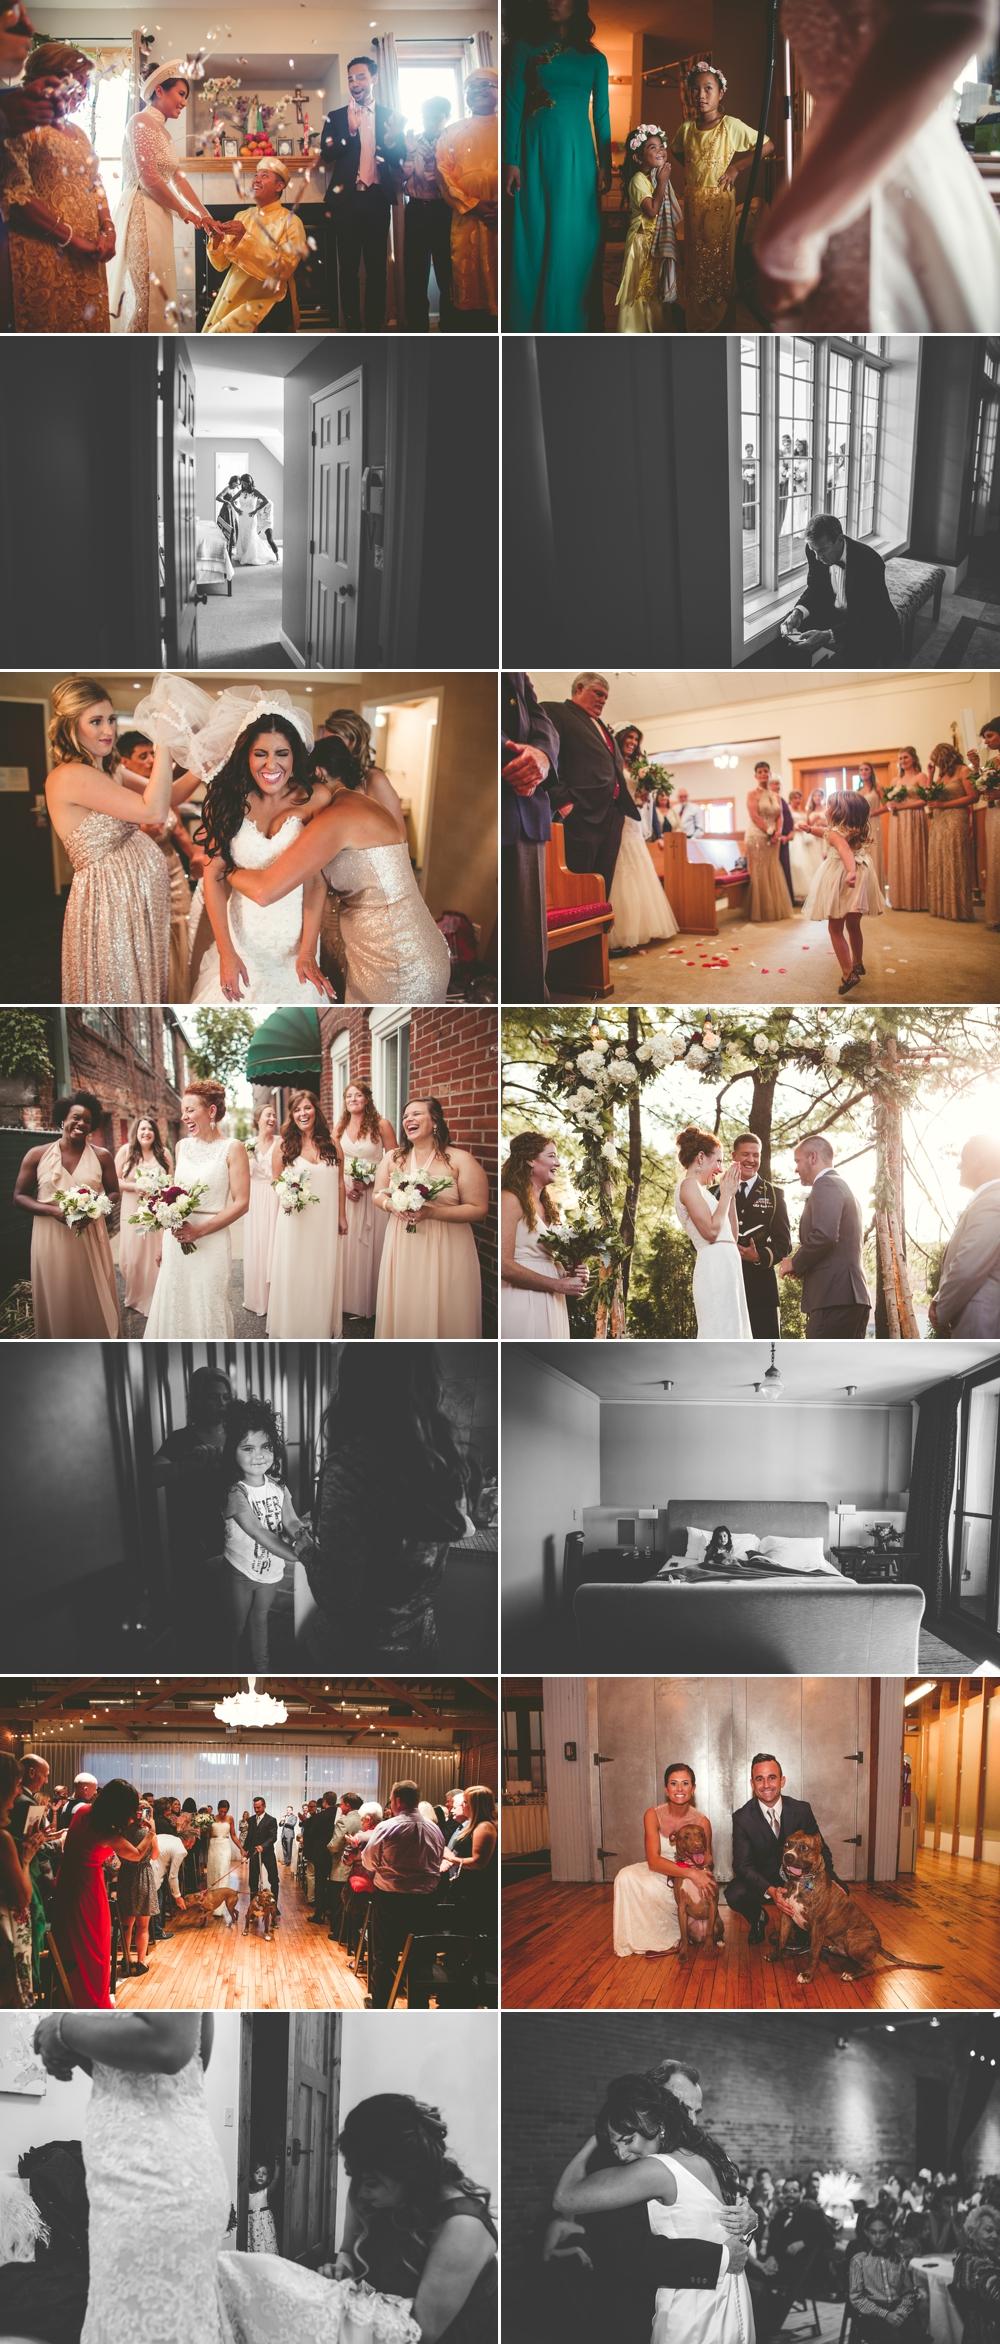 jason_domingues_photography_best_kansas_city_photography_kc_wedding_weddings0002.jpg